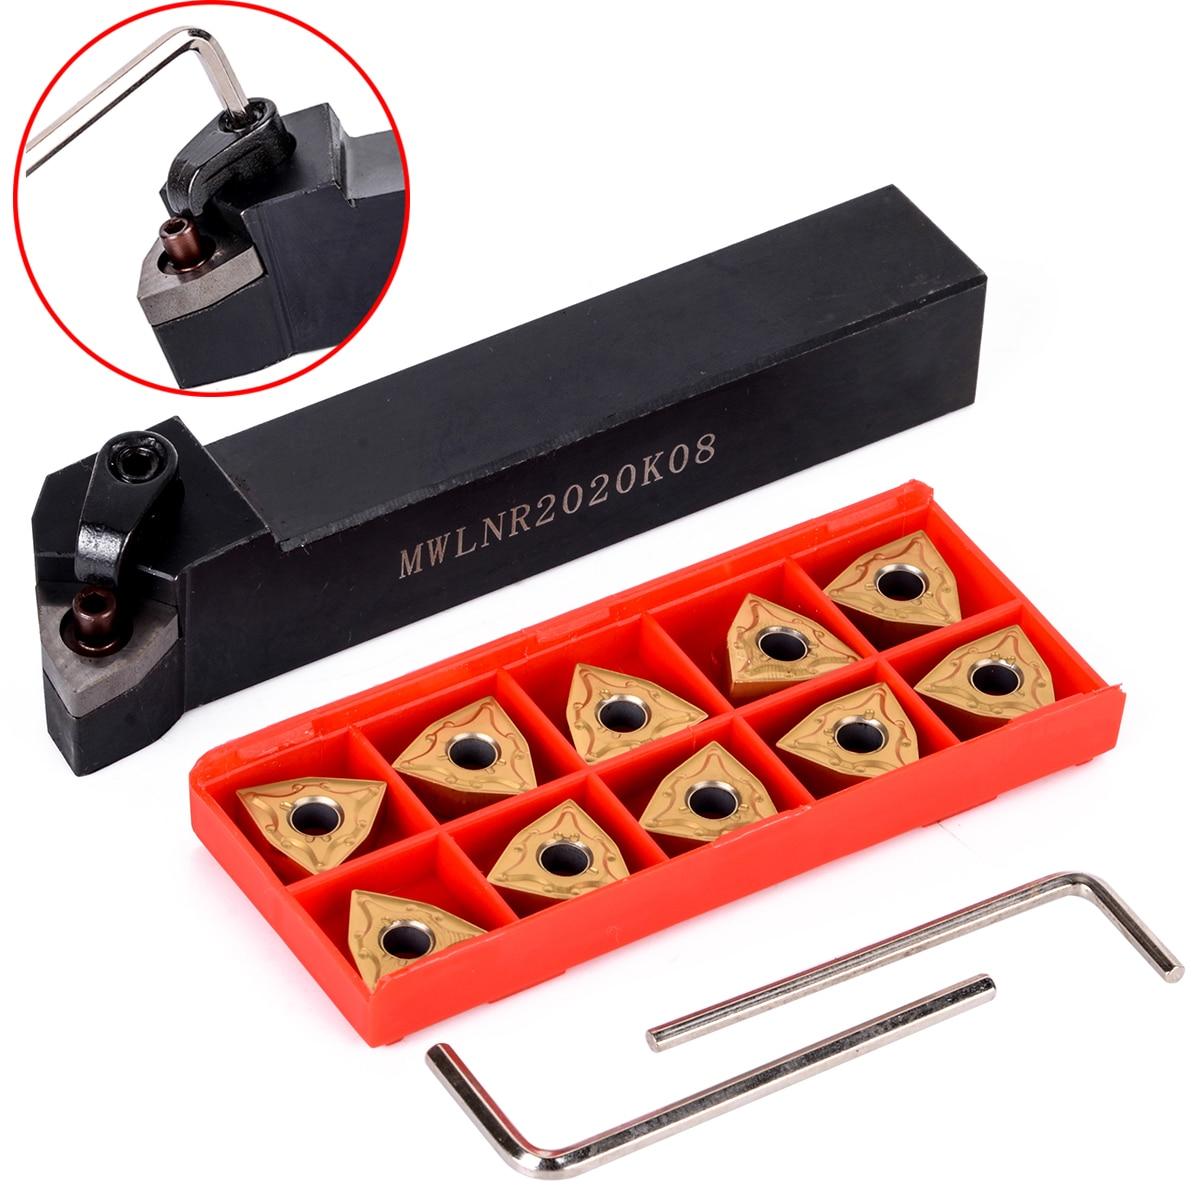 1 Set Practical Lathe Turning Tool 1pc MWLNR2020K08 Holder + 10pcs WNMG080404 Carbide Insert 5pcs set new 3 8 tip carbide indexable turning tool set mayitr good hardness precision insert lathe tool bit